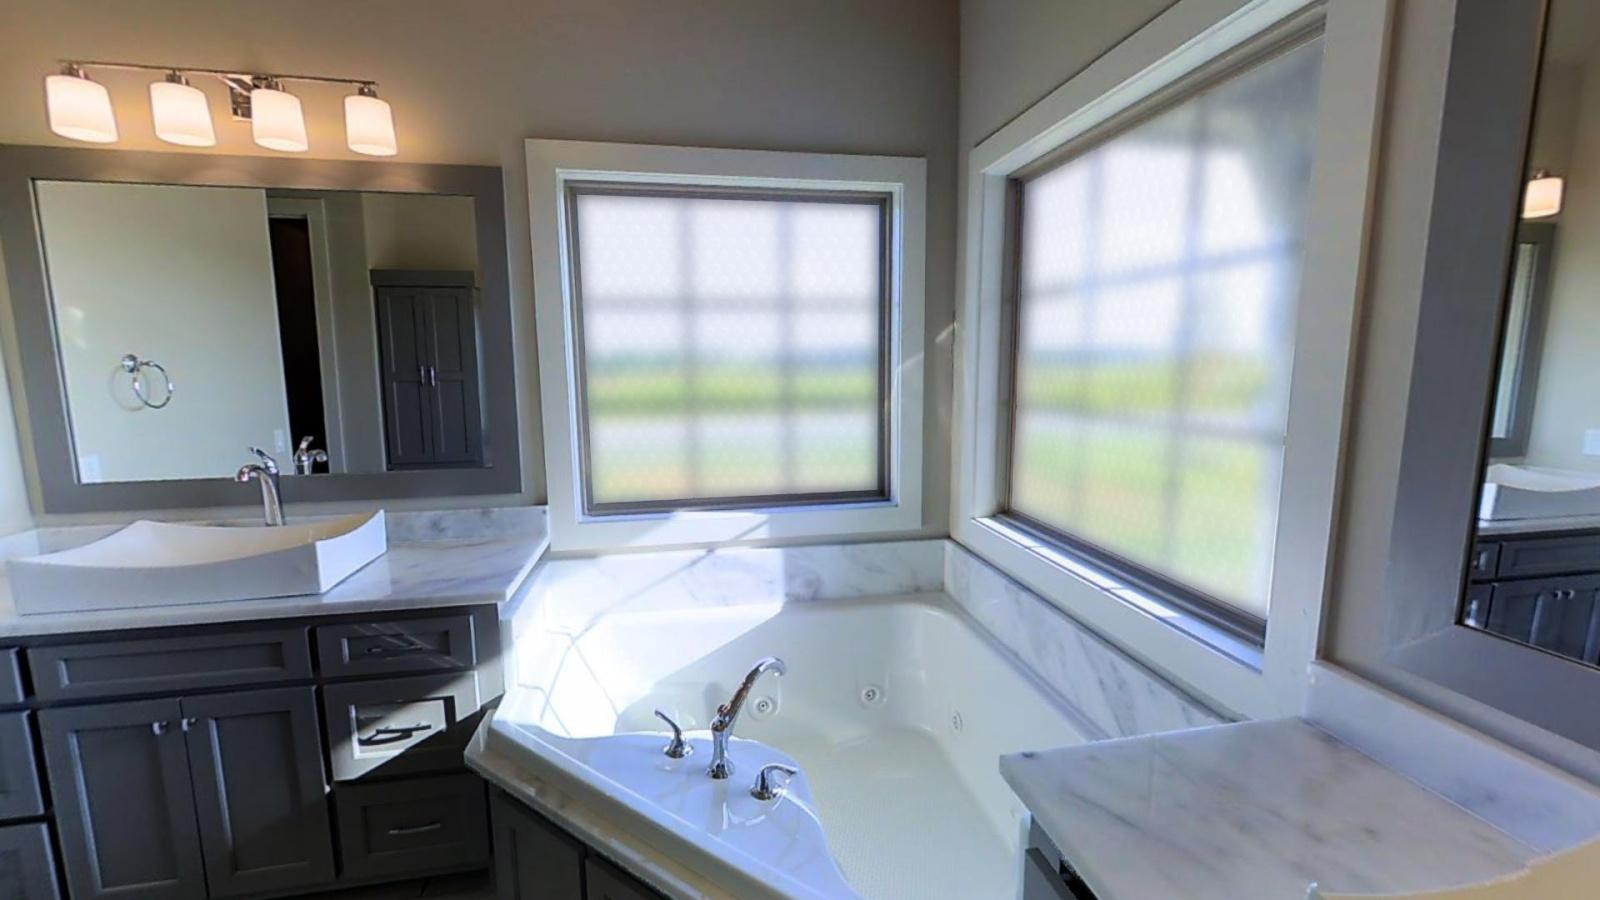 4 Bedrooms Bedrooms, ,4 BathroomsBathrooms,Custom Home,Home Plans,1044